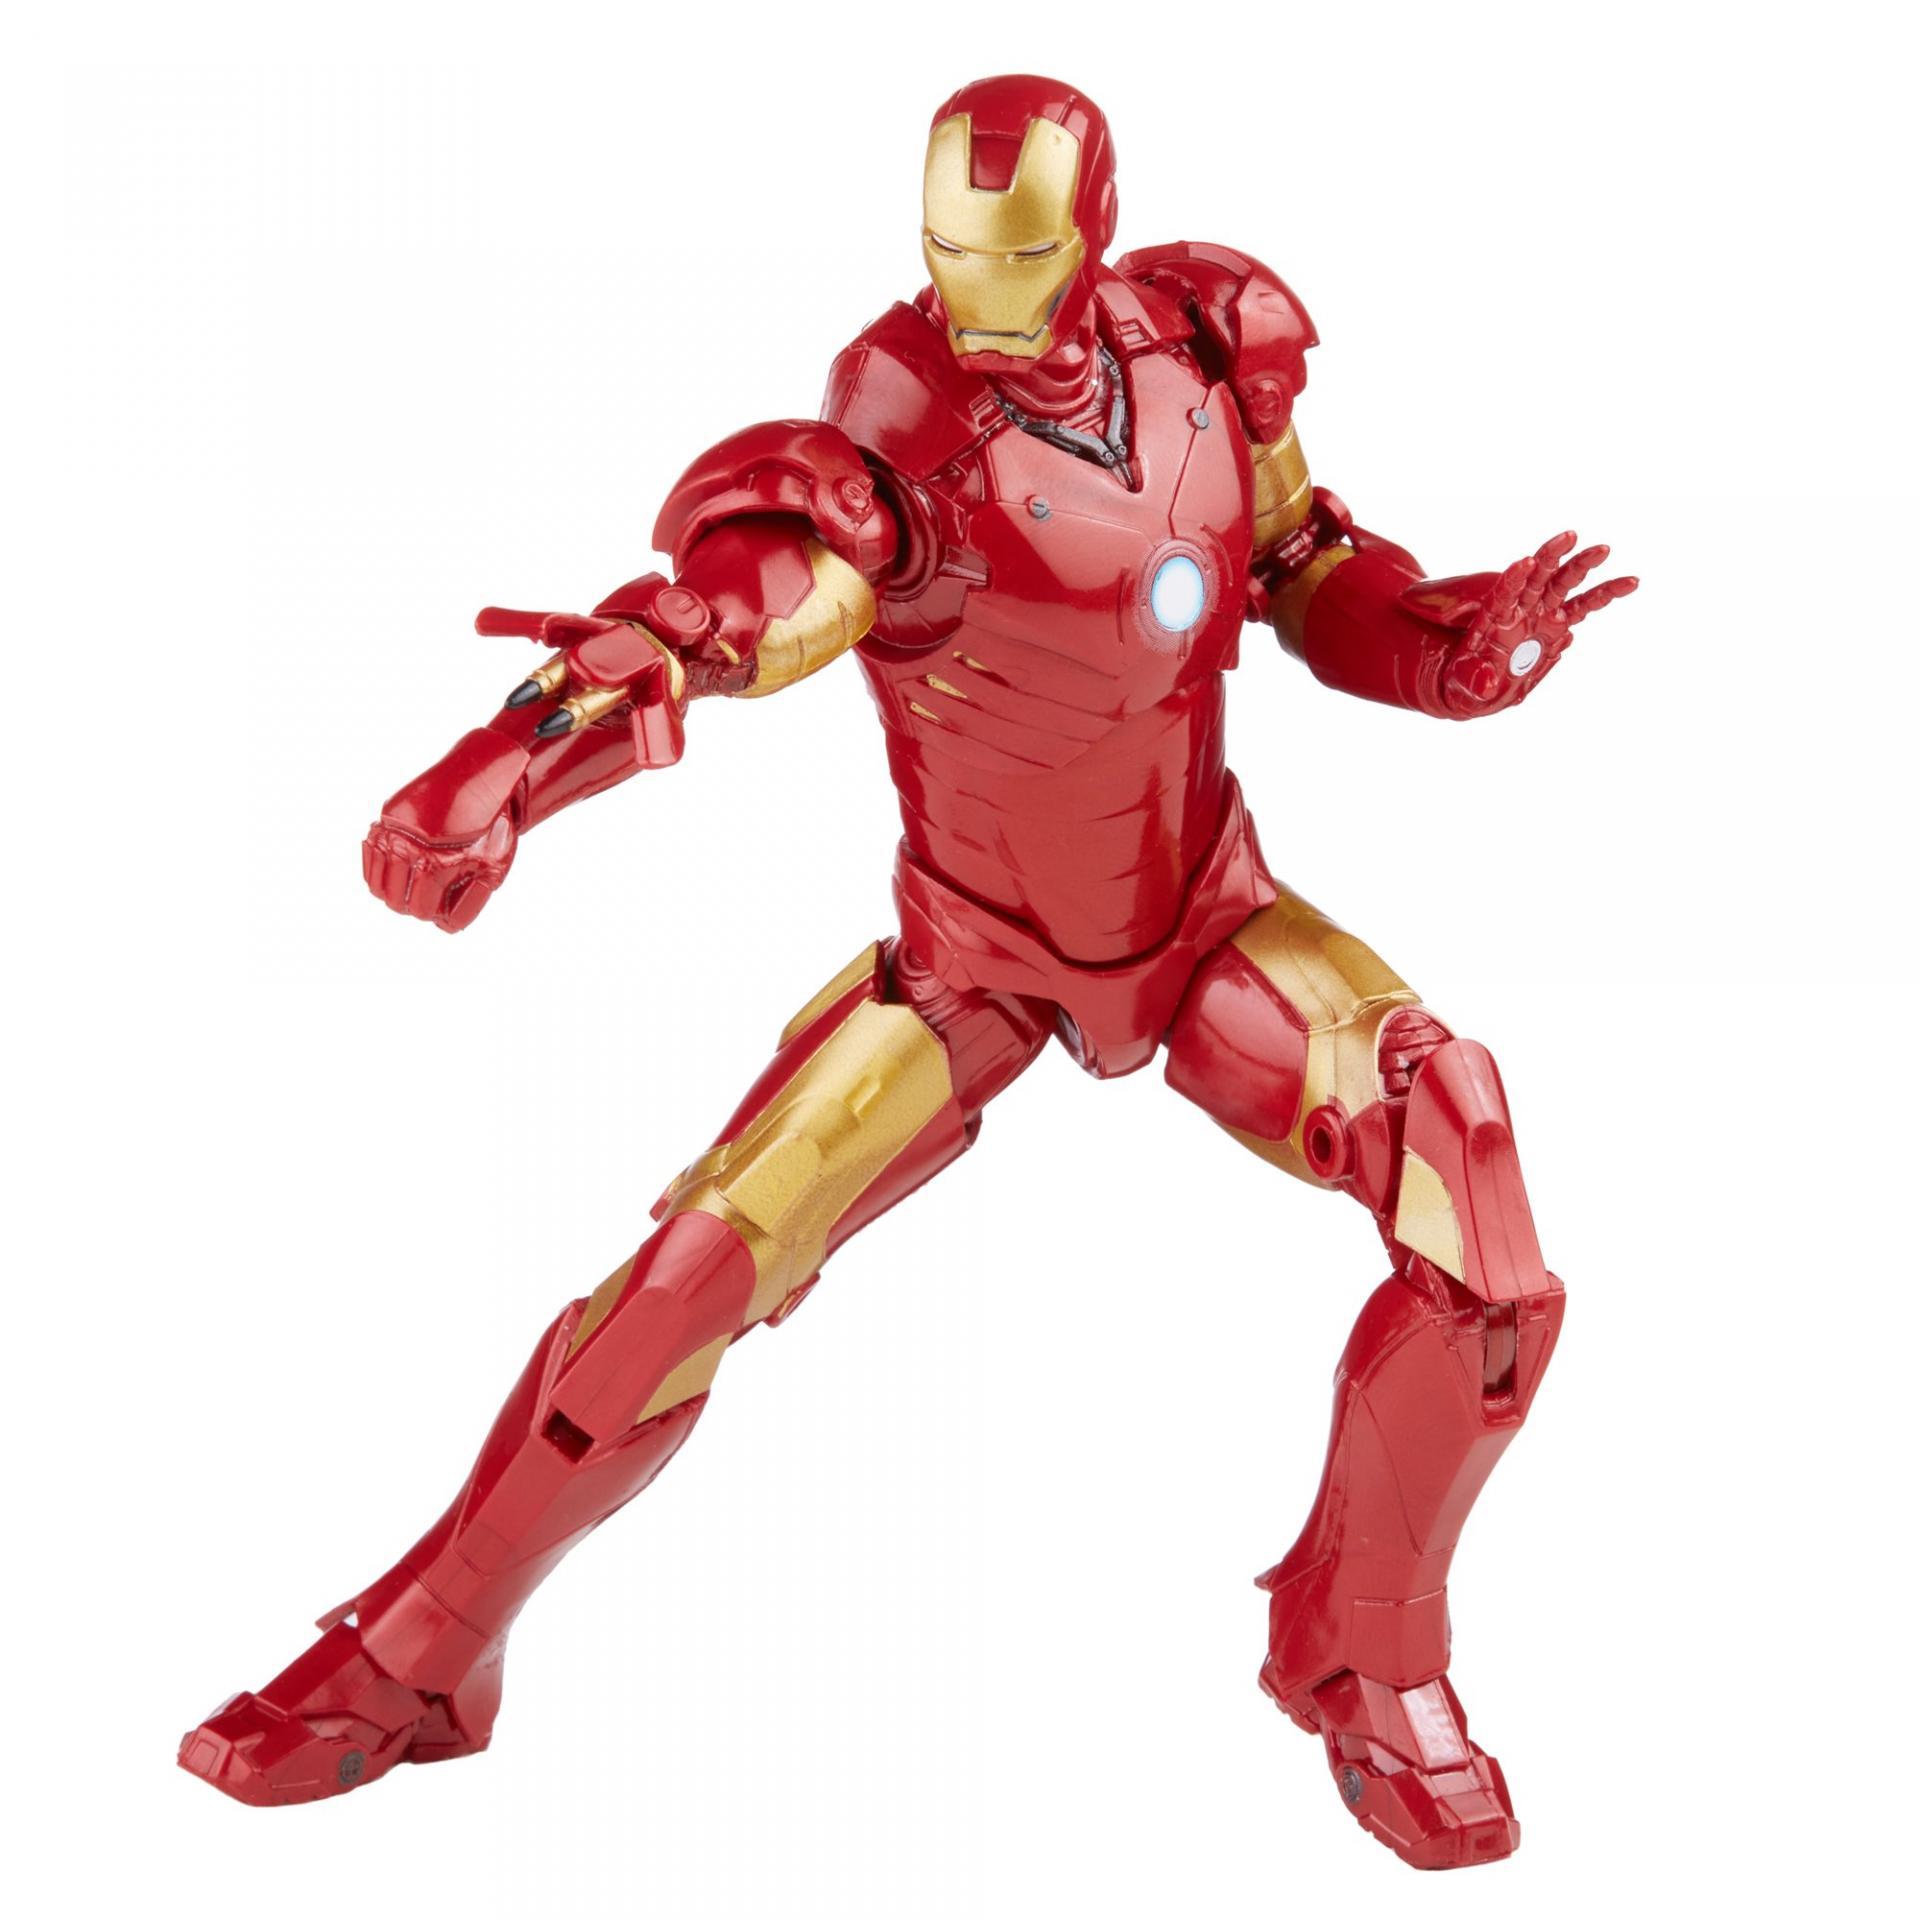 Marvel legends series hasbro iron man mark 312